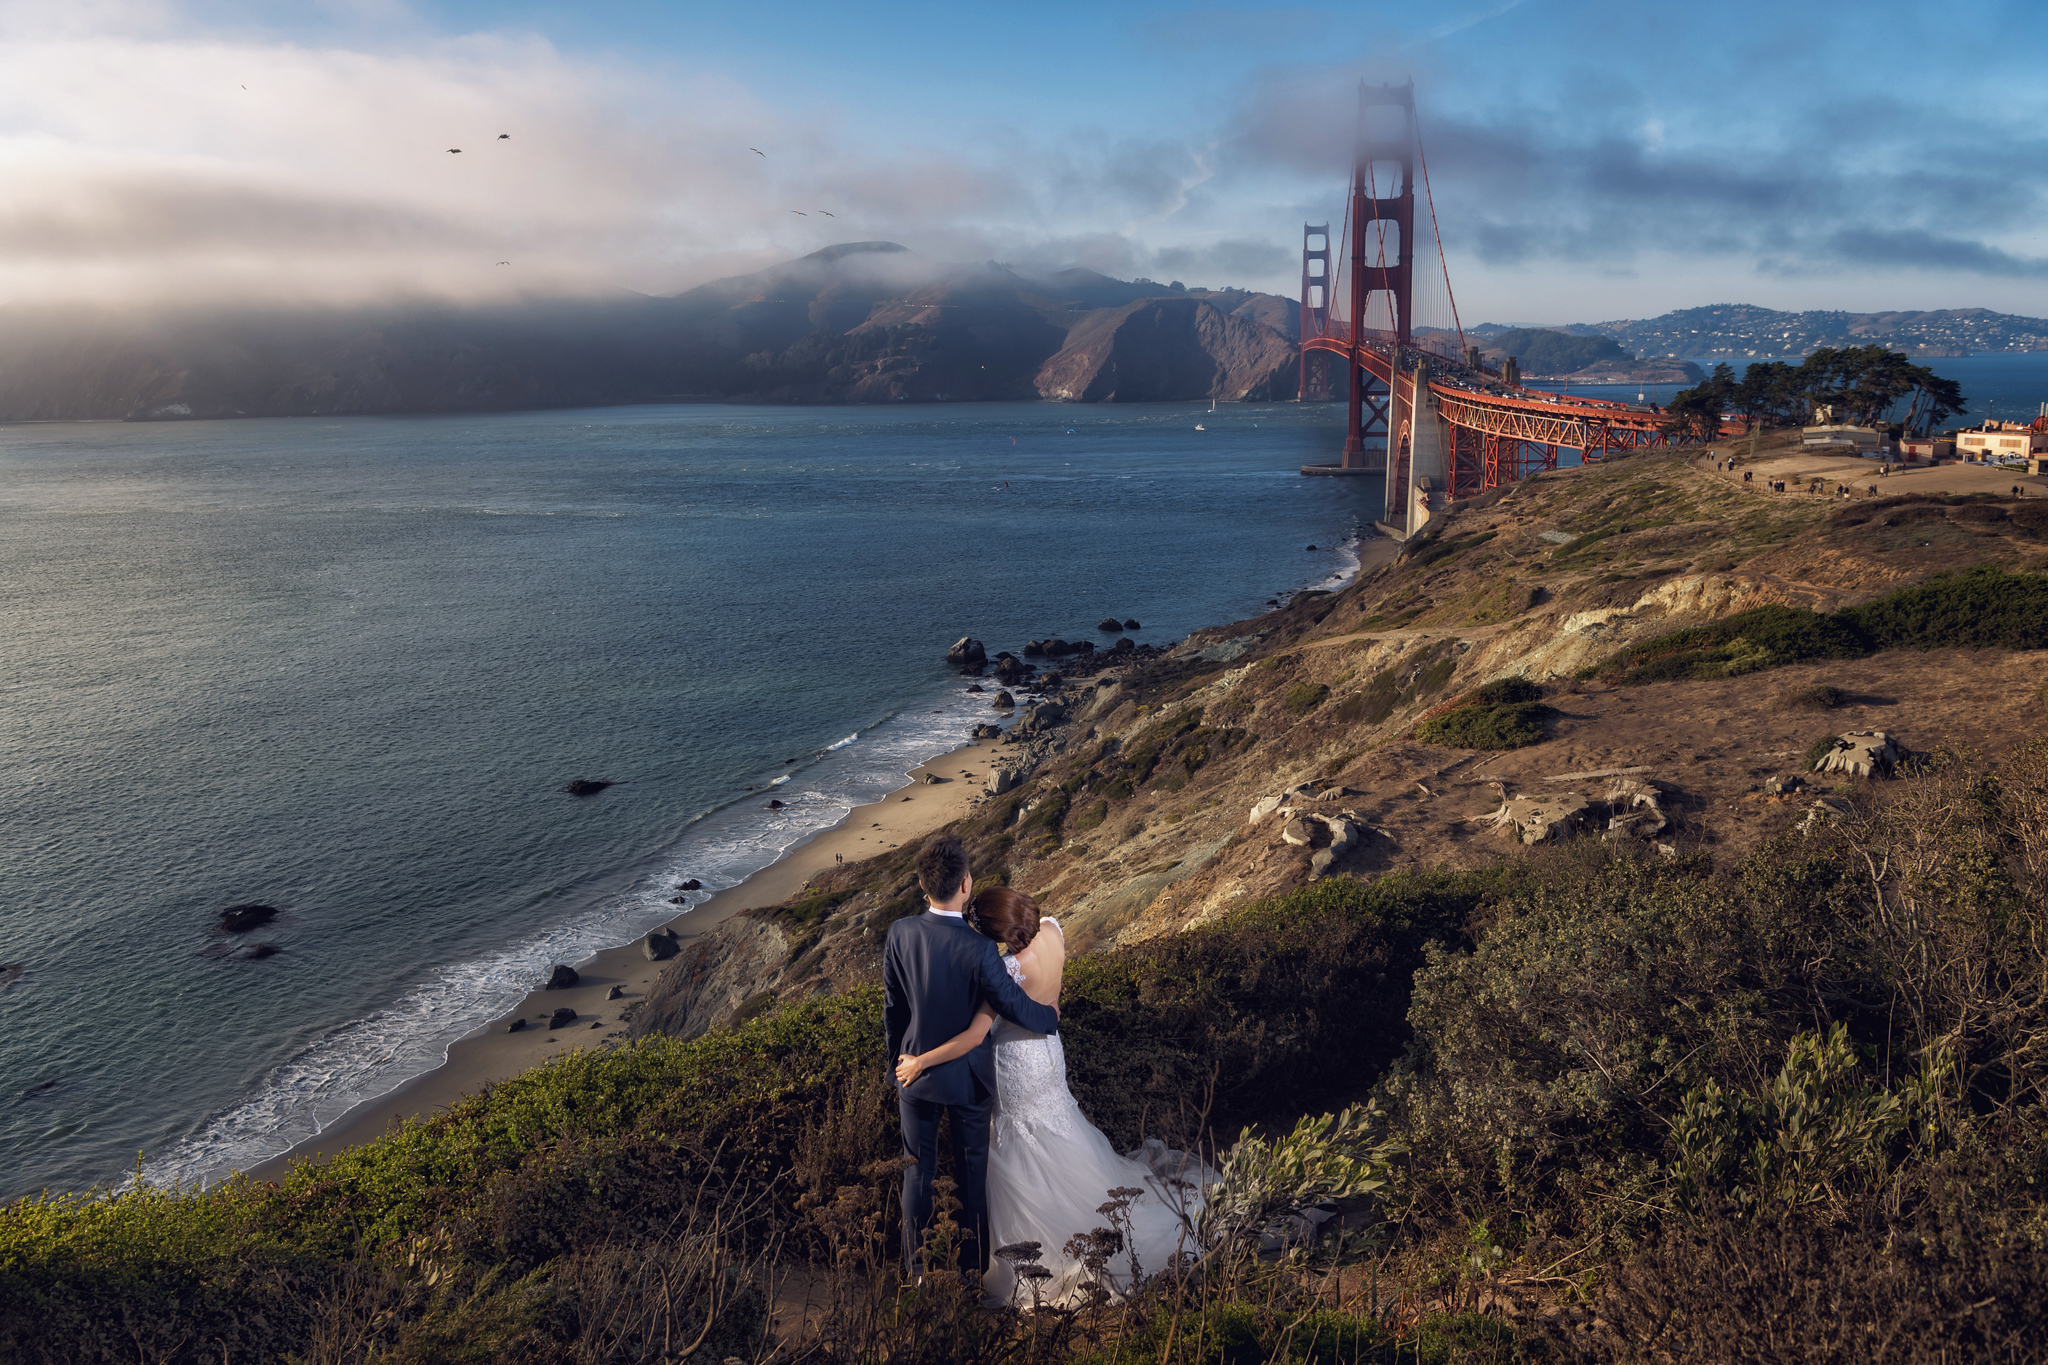 Donfer, 海外婚紗, World tour, 東法, EASTERN WEDDING, 世界旅拍, 舊金山, san francisco, 美西婚紗